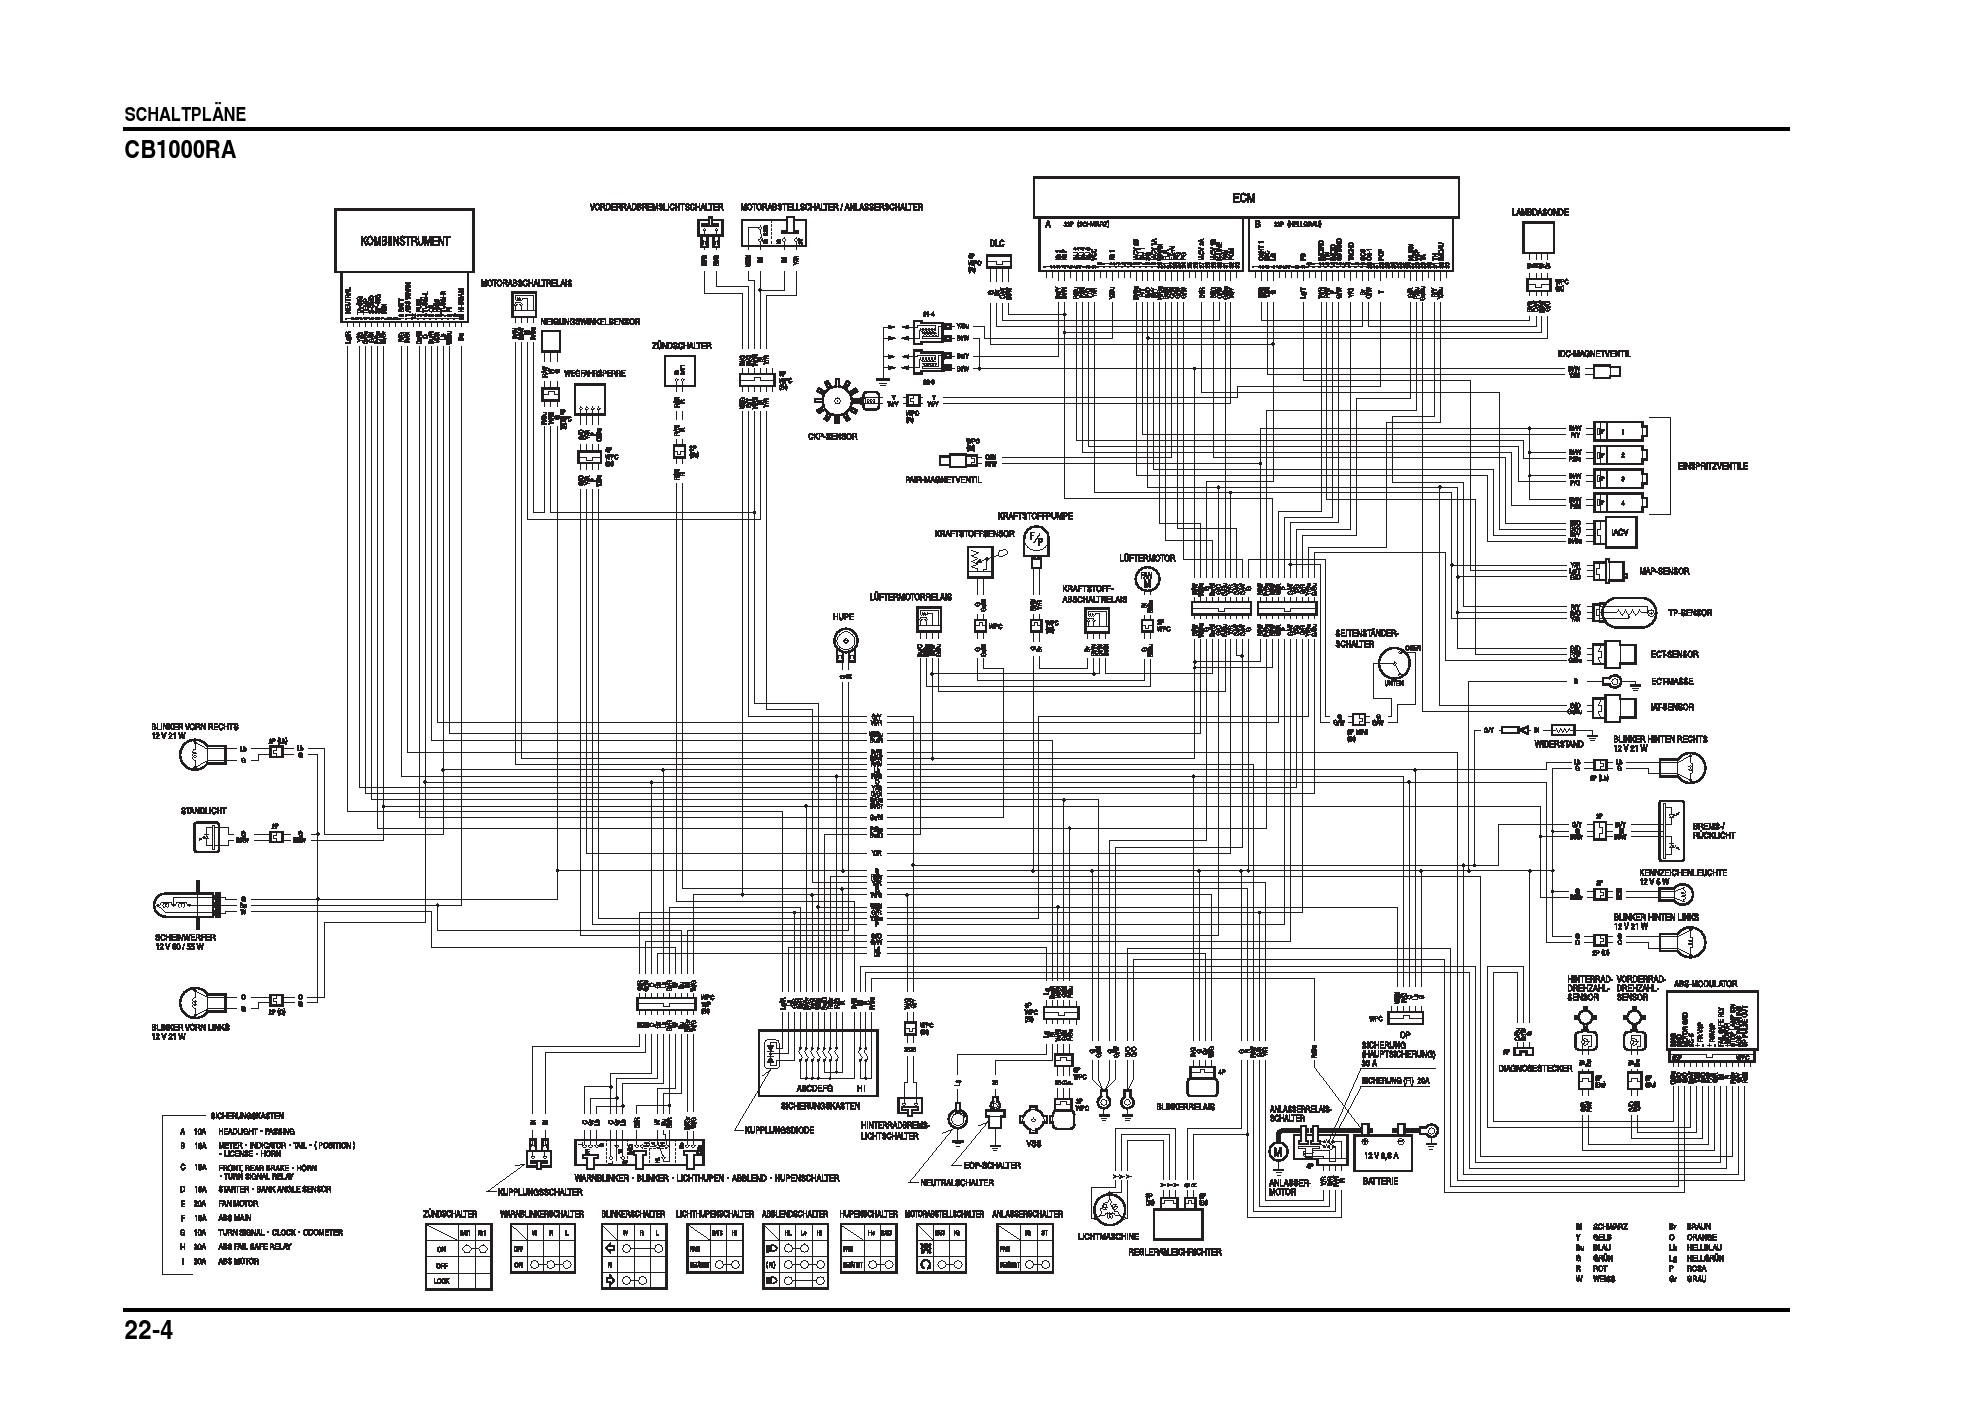 CB1000R wiring diagram